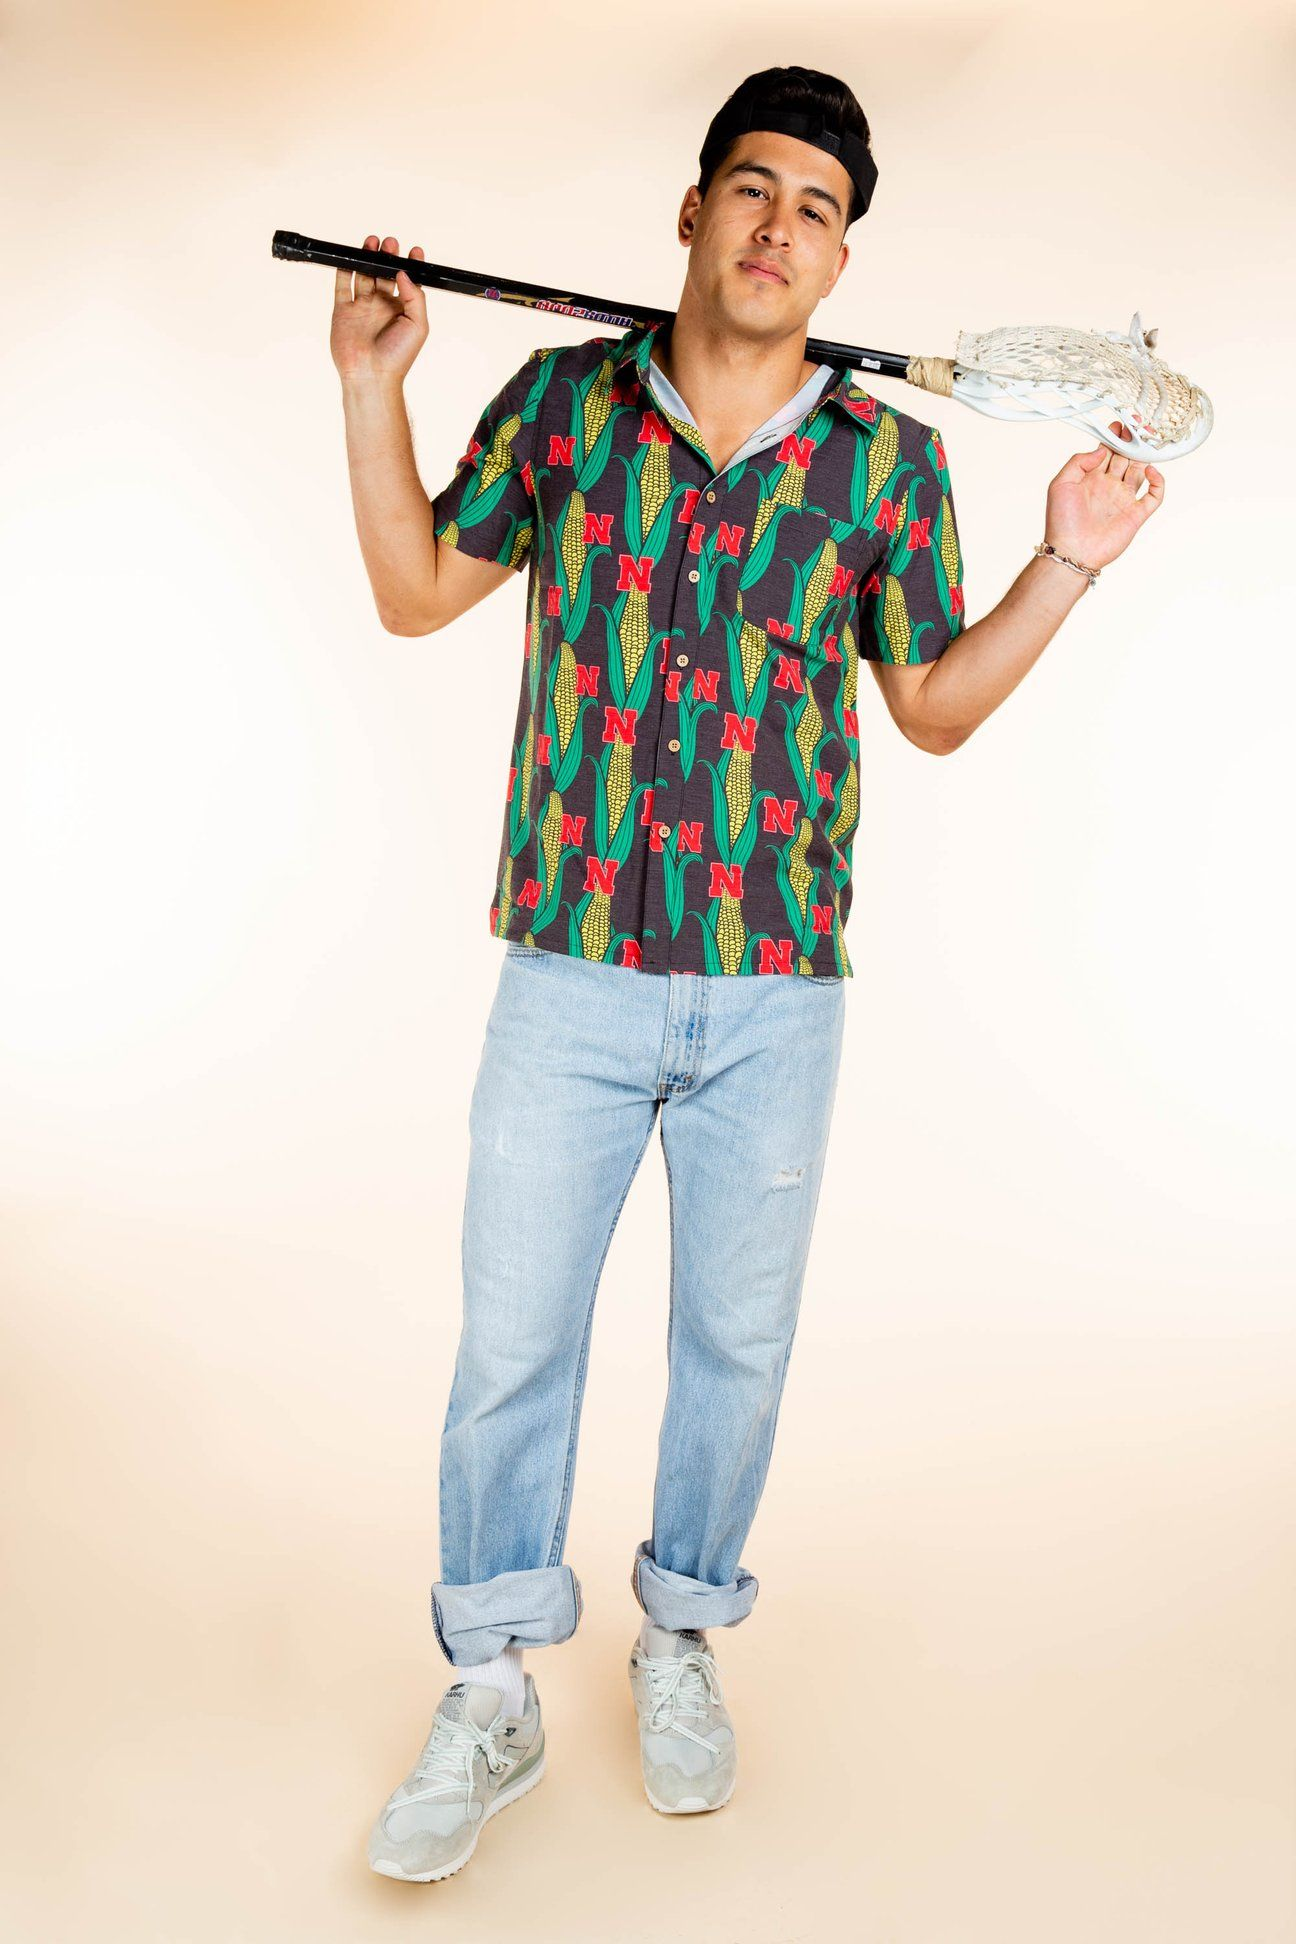 The Husker Shucker Nebraska Corn Hawaiian Shirt Camping Shirt Hawaiian Shirt Casual Button Down Shirt